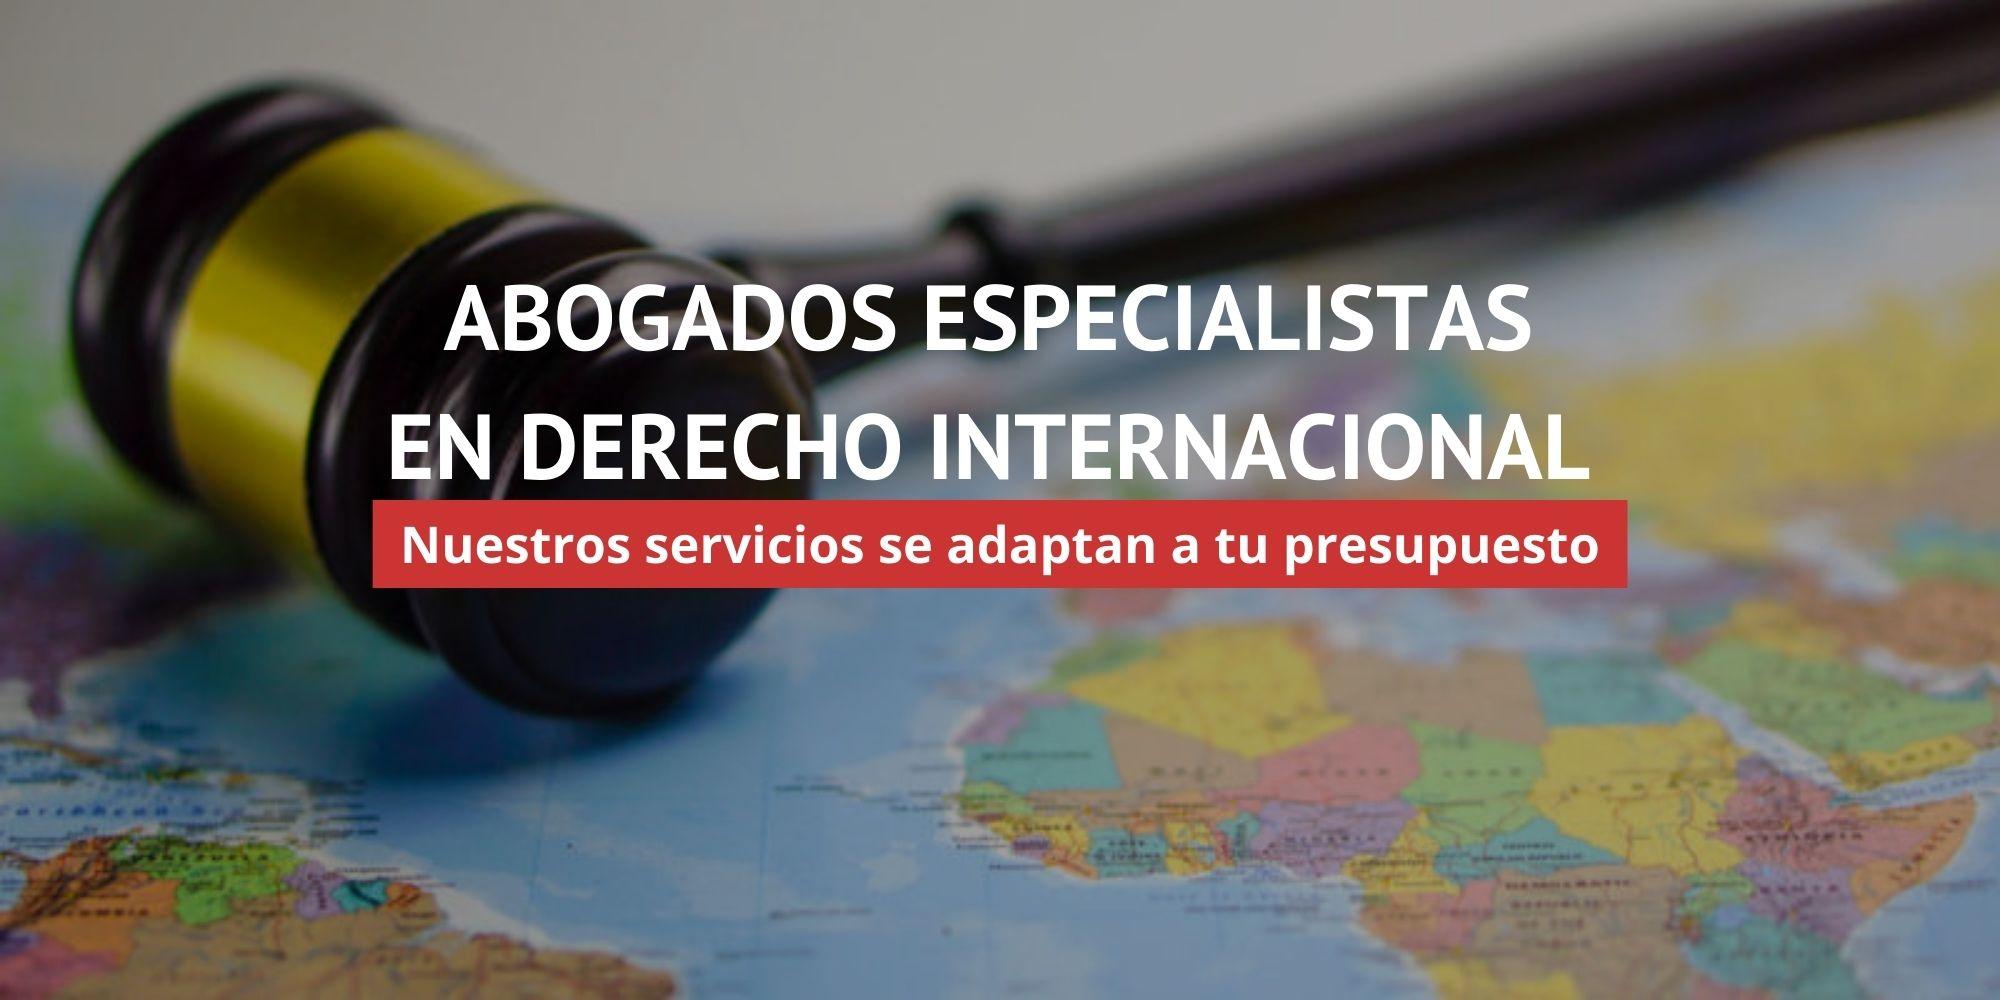 Abogados Derecho Internacional Murcia - Primera Visita Gratis | ACC LEGAL ABOGADOS